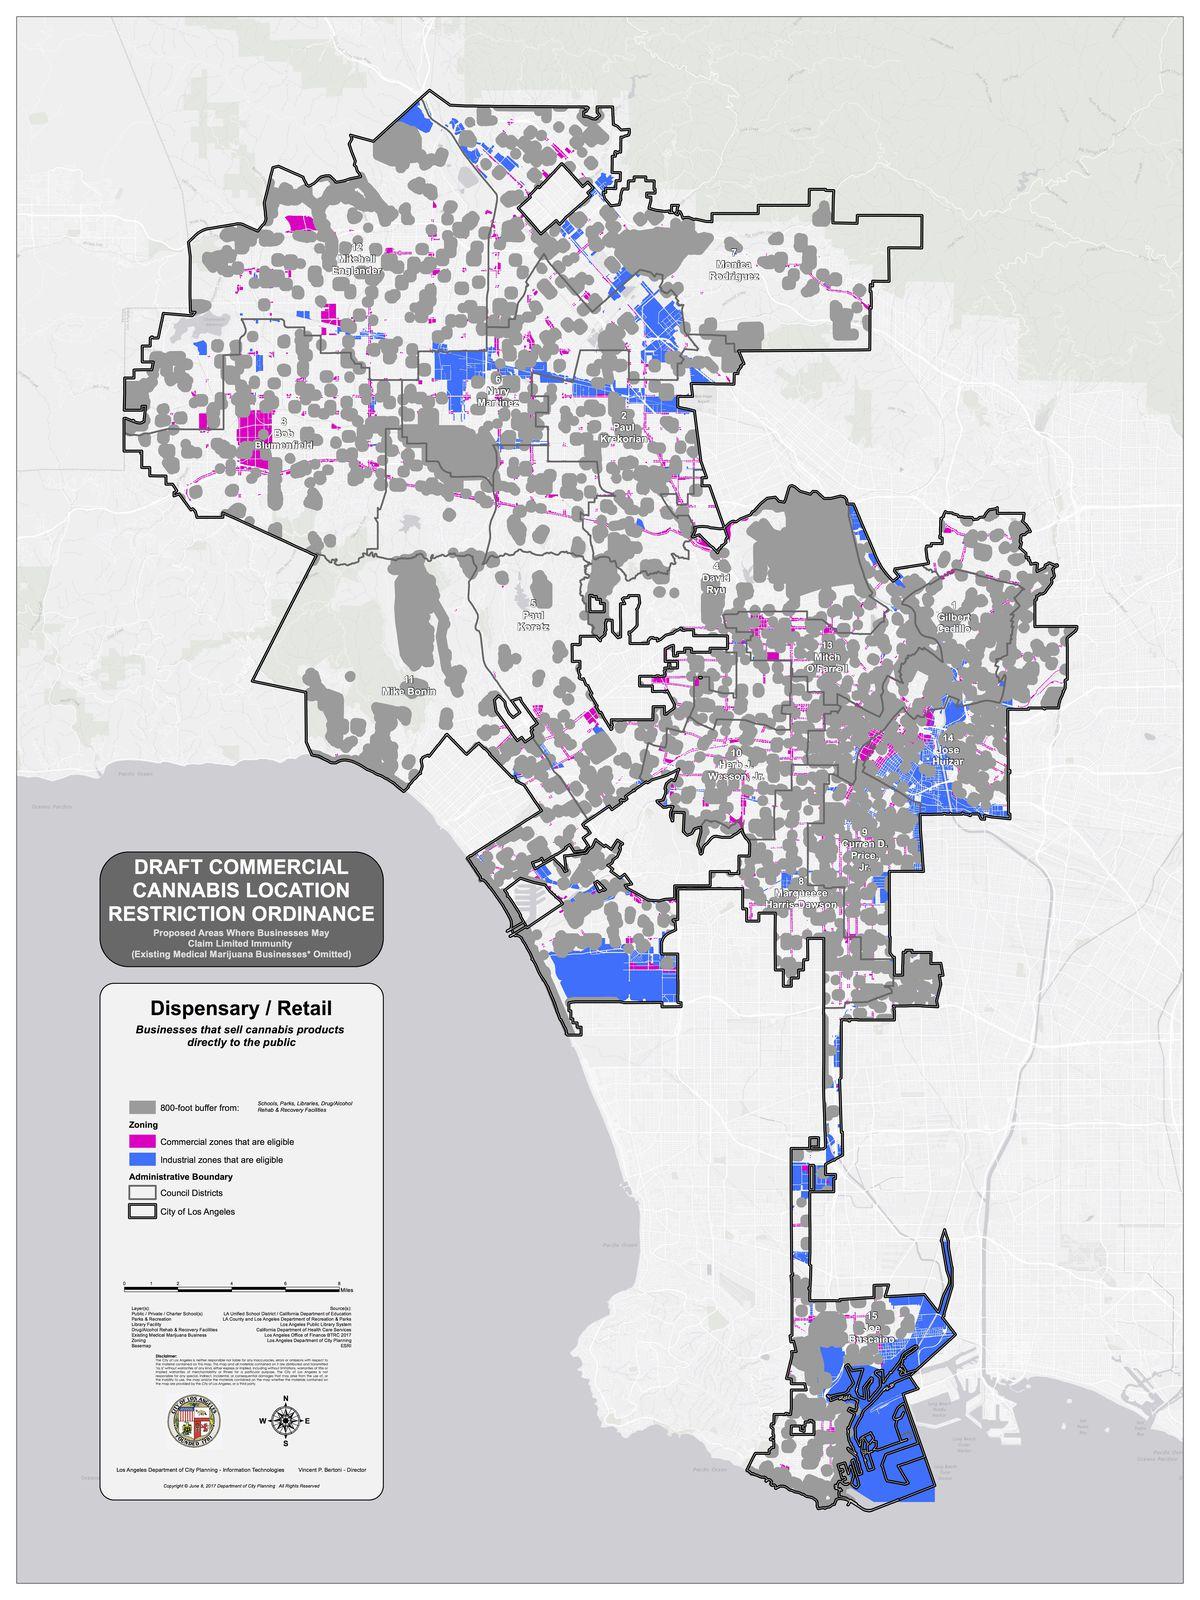 New map shows where LA would allow marijuana dispensaries